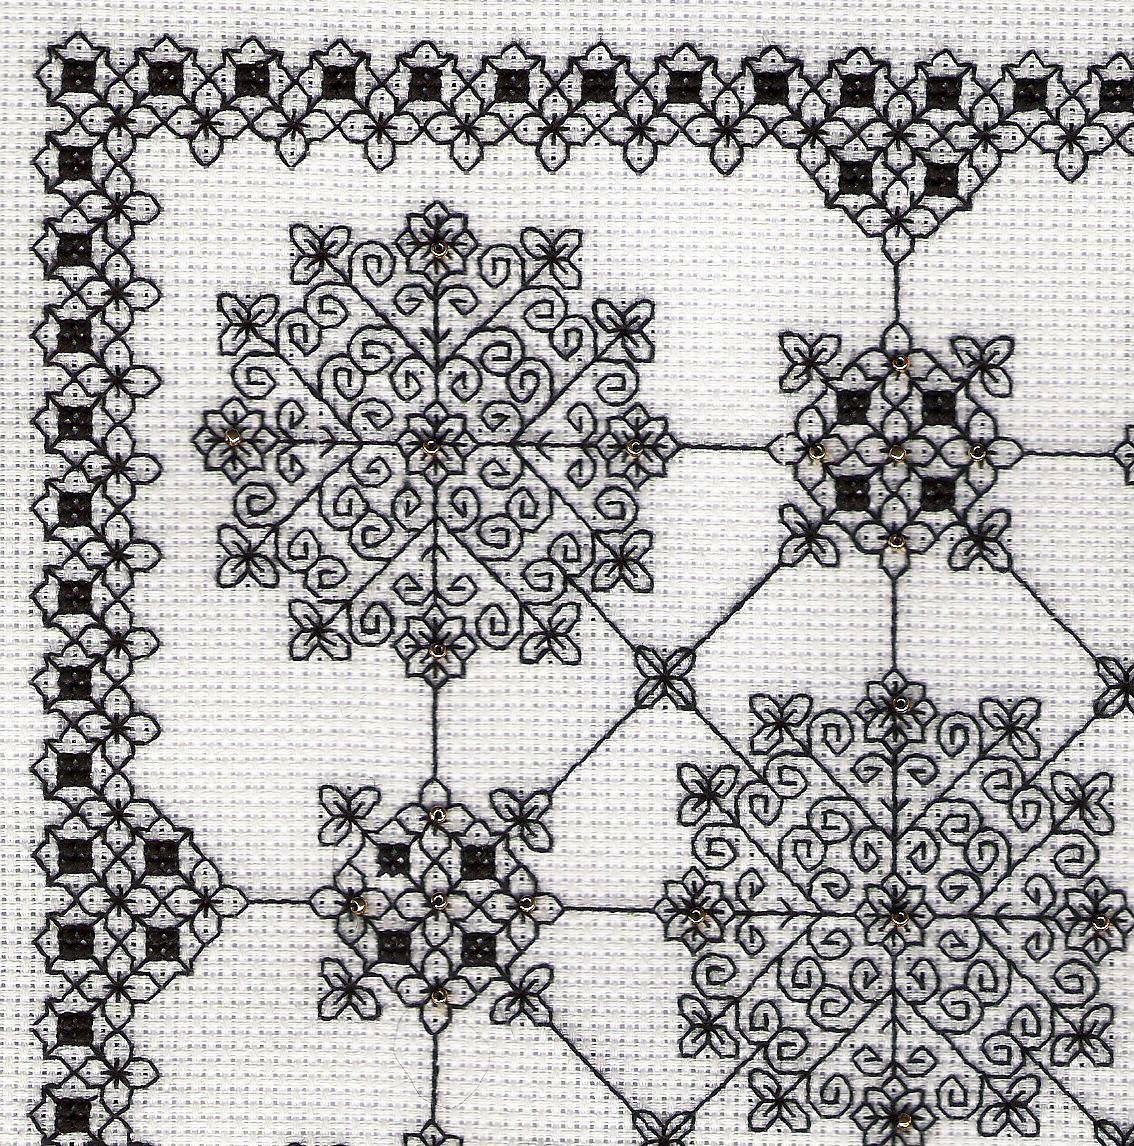 Simplicity - blackwork design by Liz Almond of Blackwork Journey ...